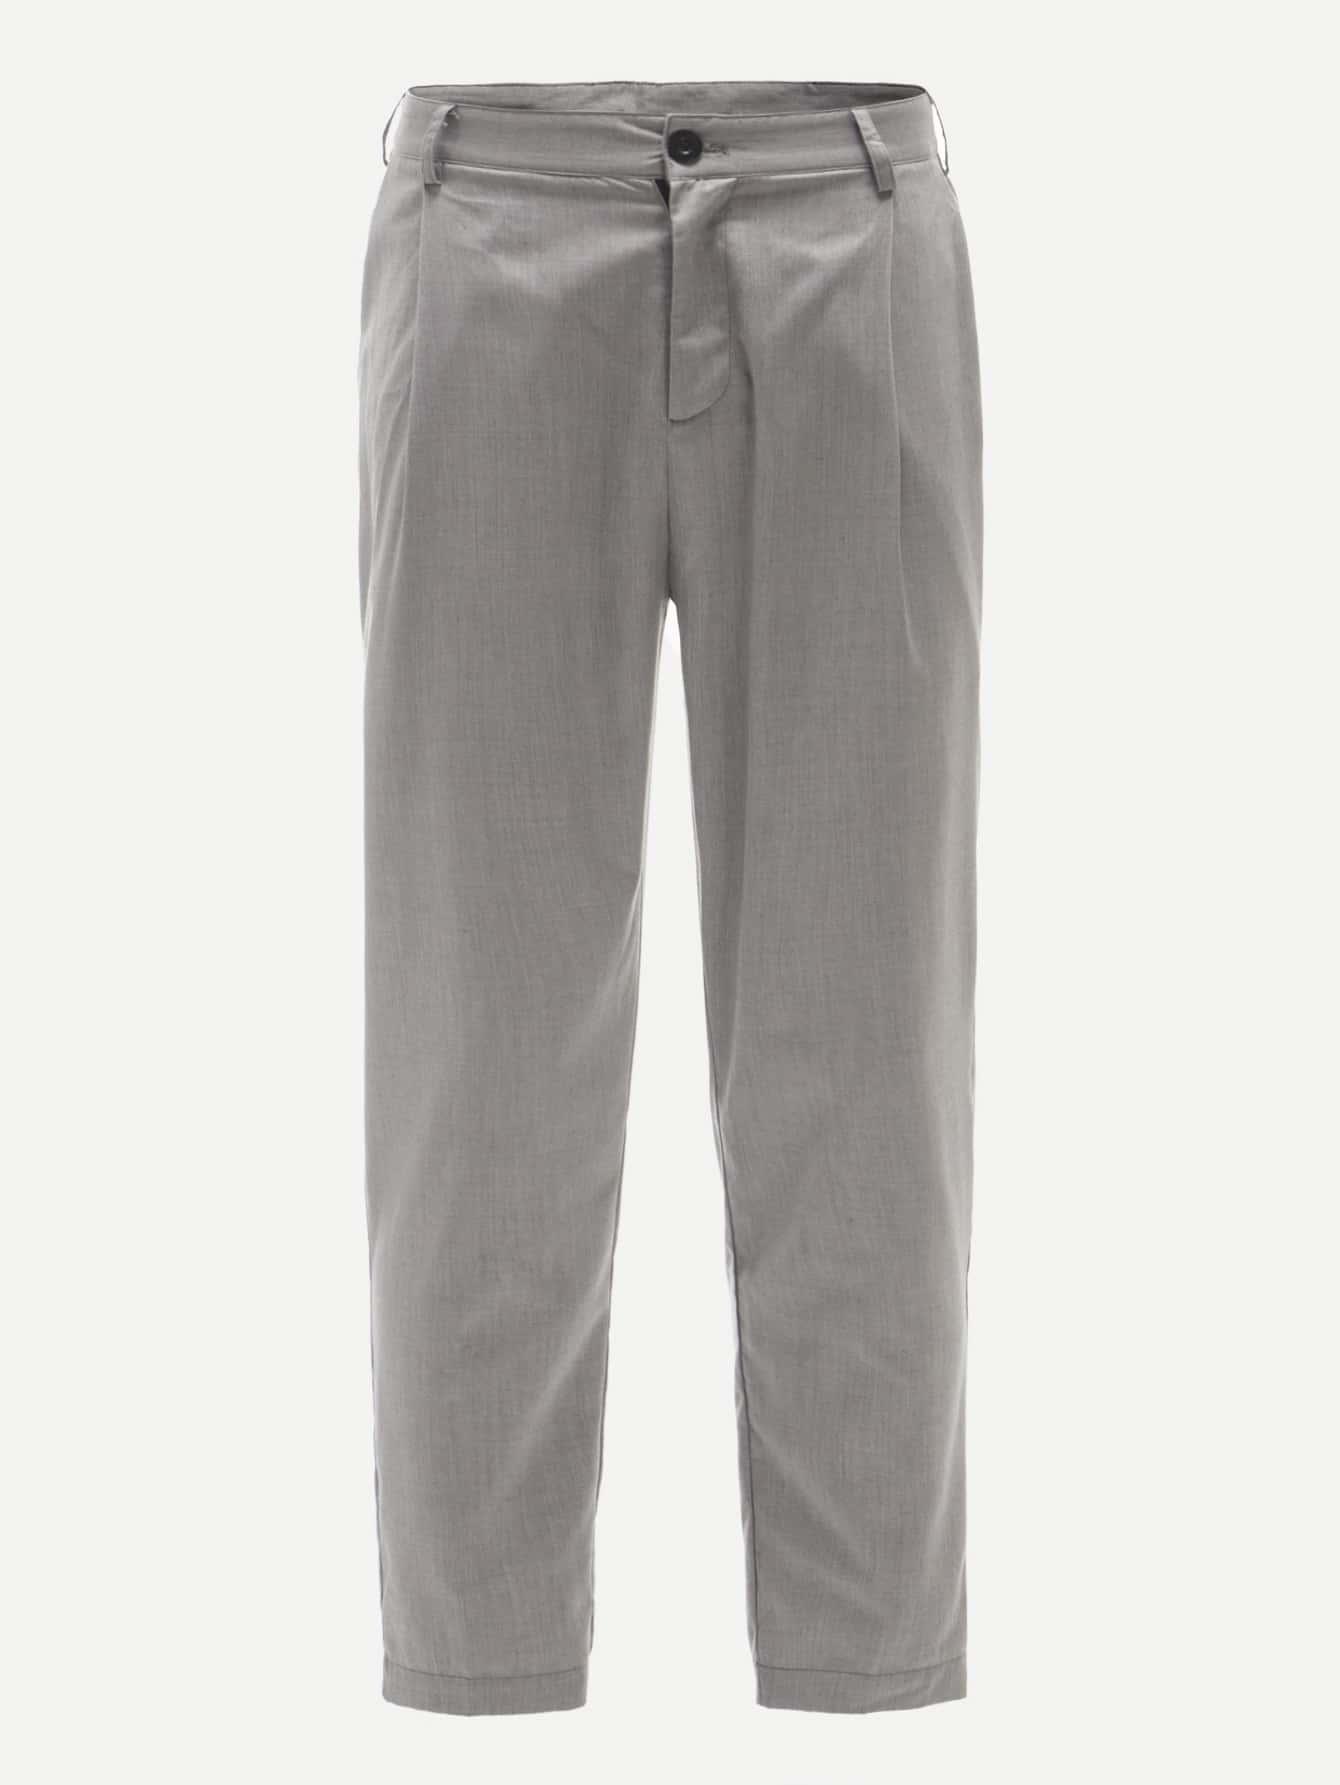 Купить Мужские брюки с косами карманами, null, SheIn